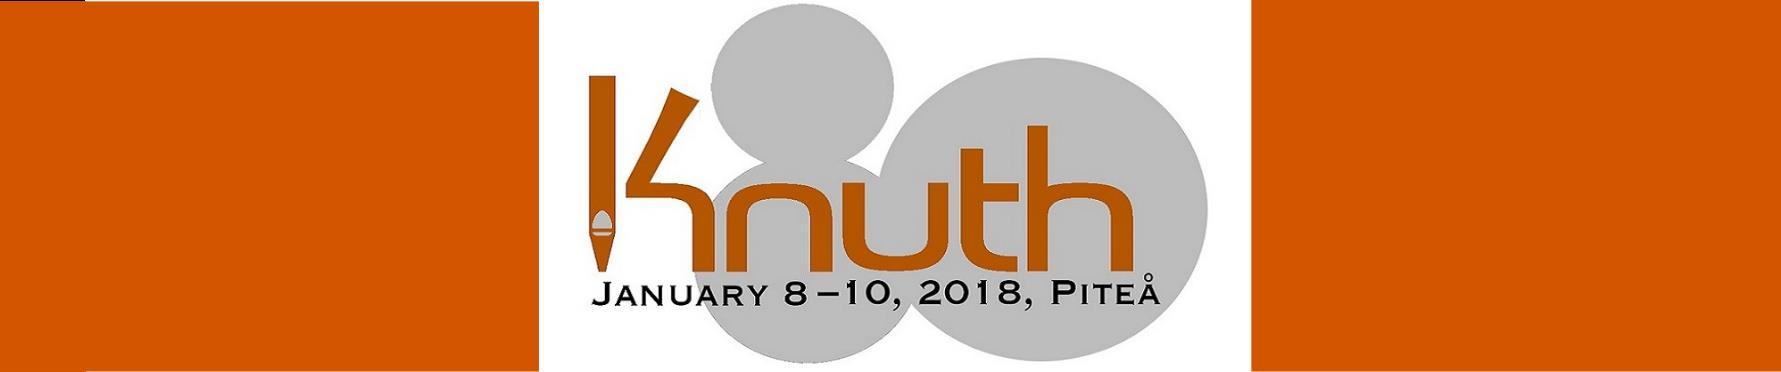 cropped-Knuth80-orange-2